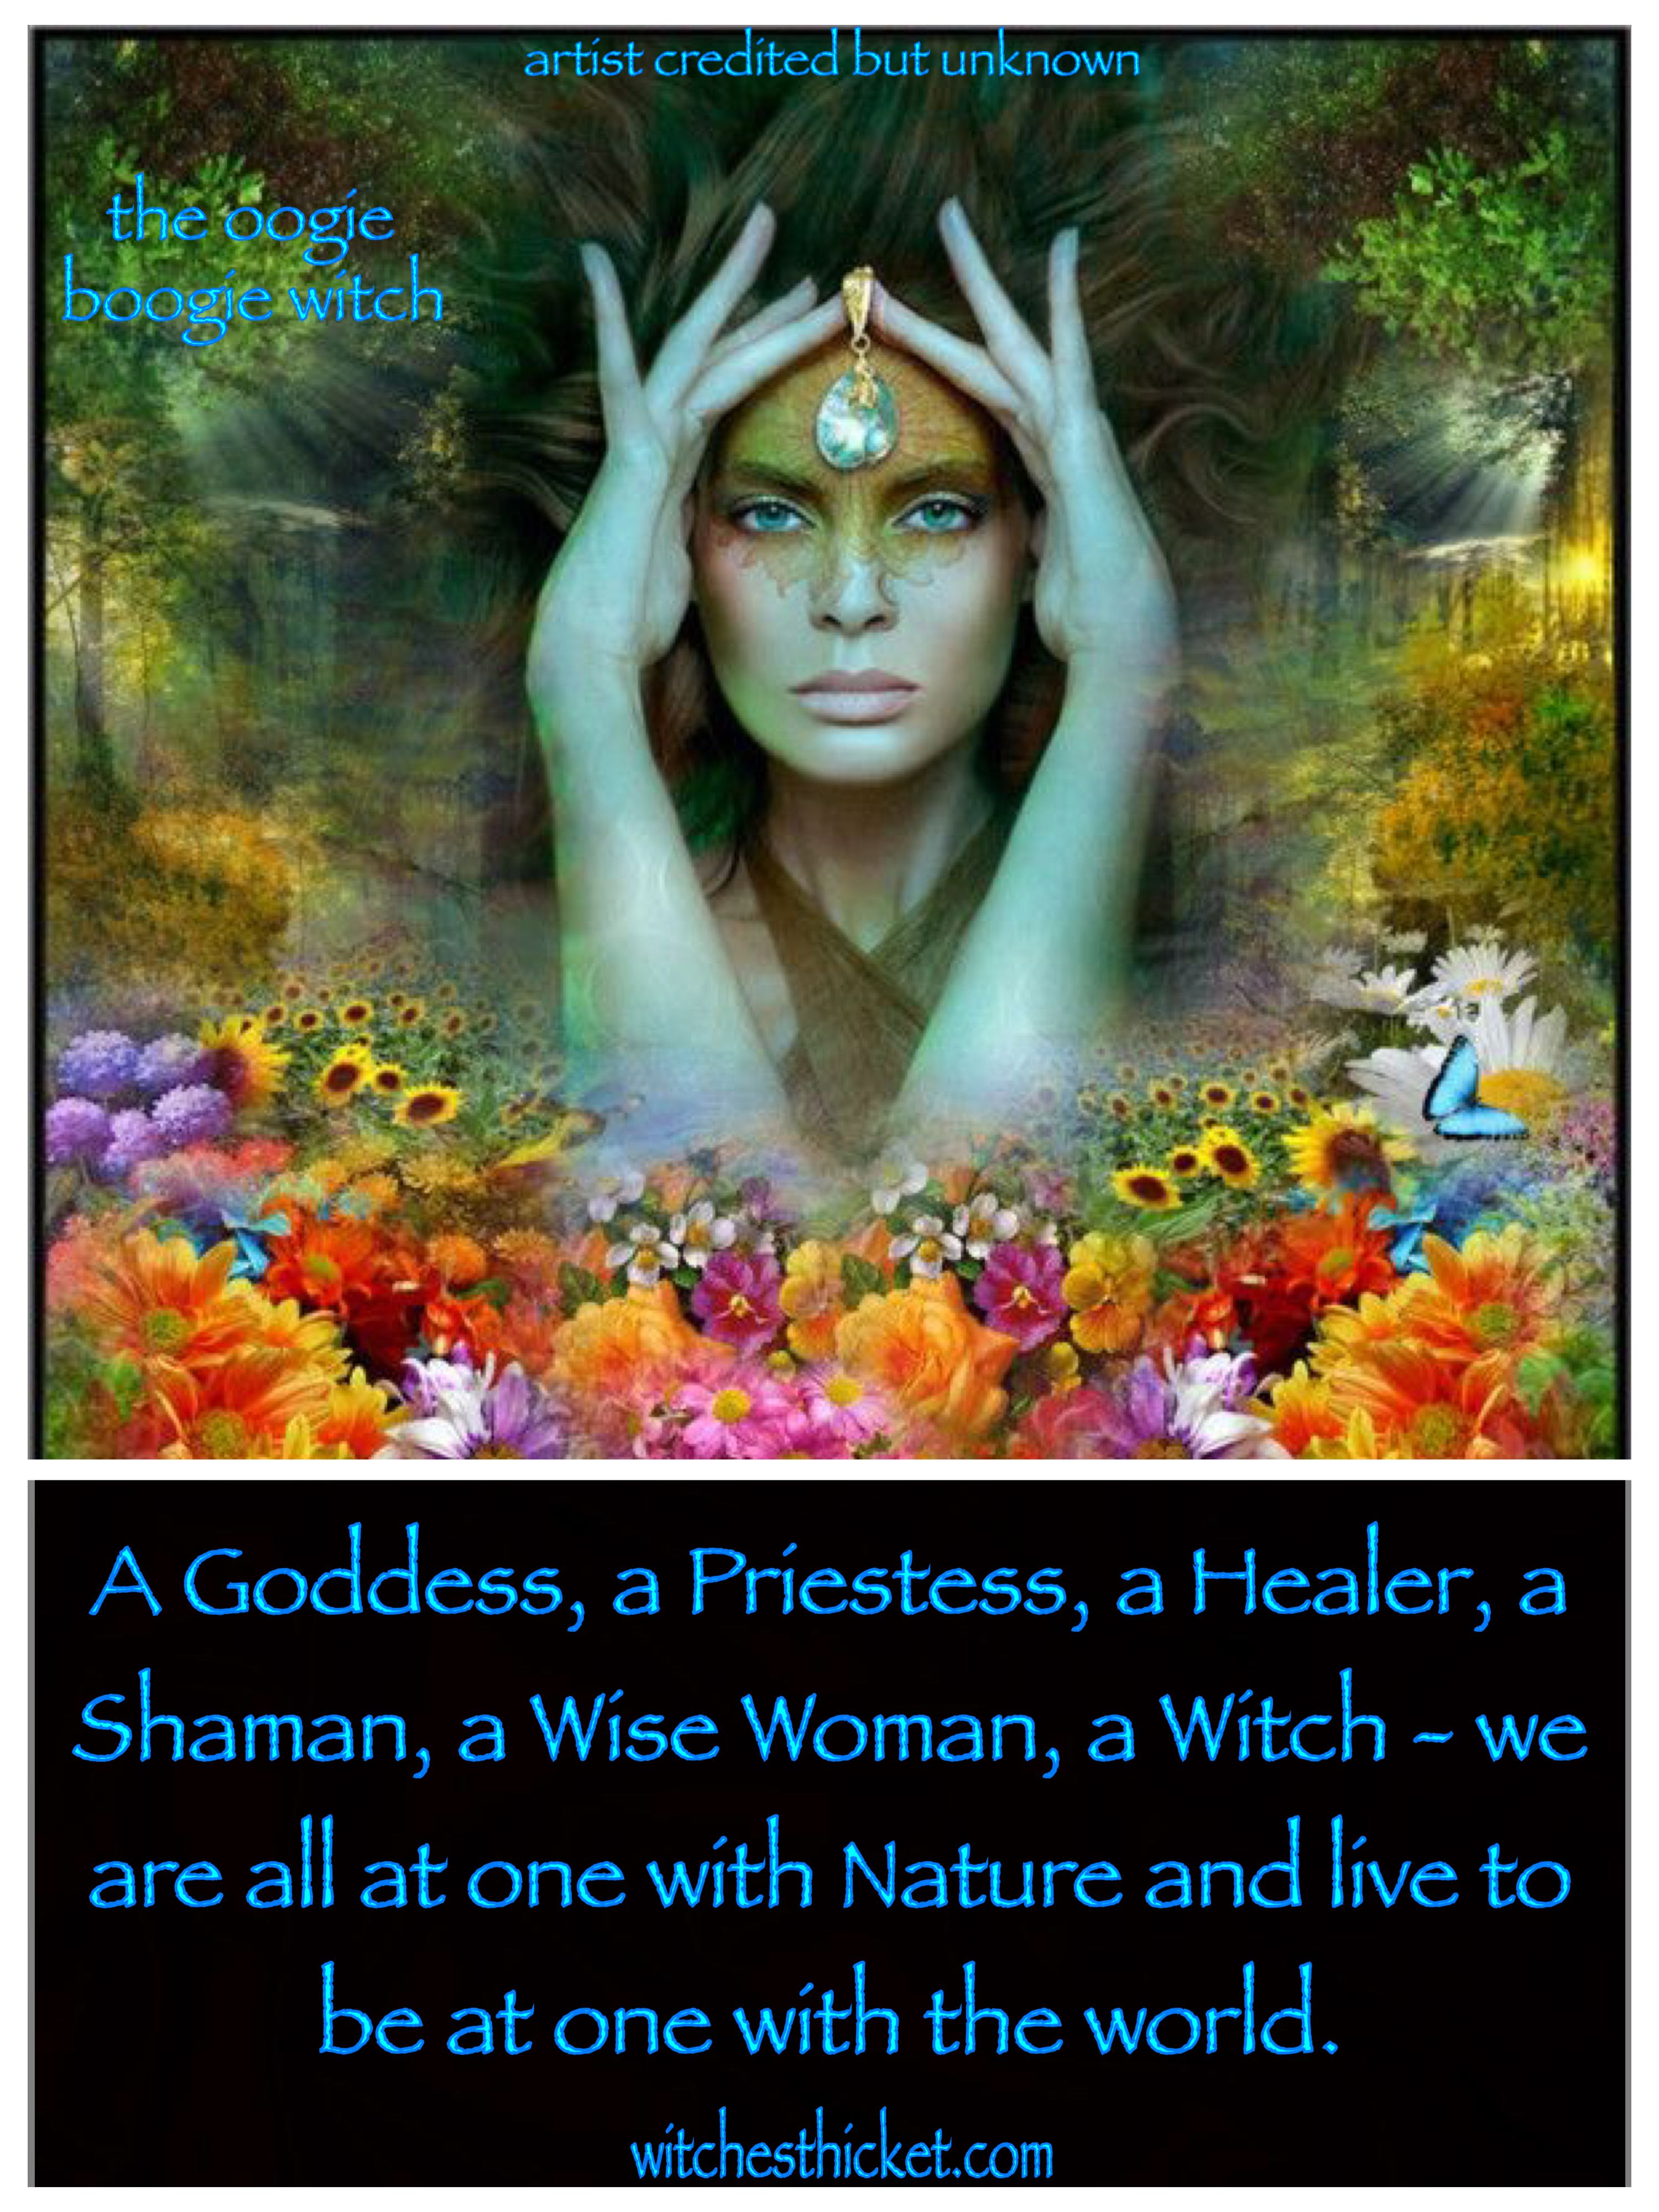 A goddess a priestess a healer a shaman a wise woman